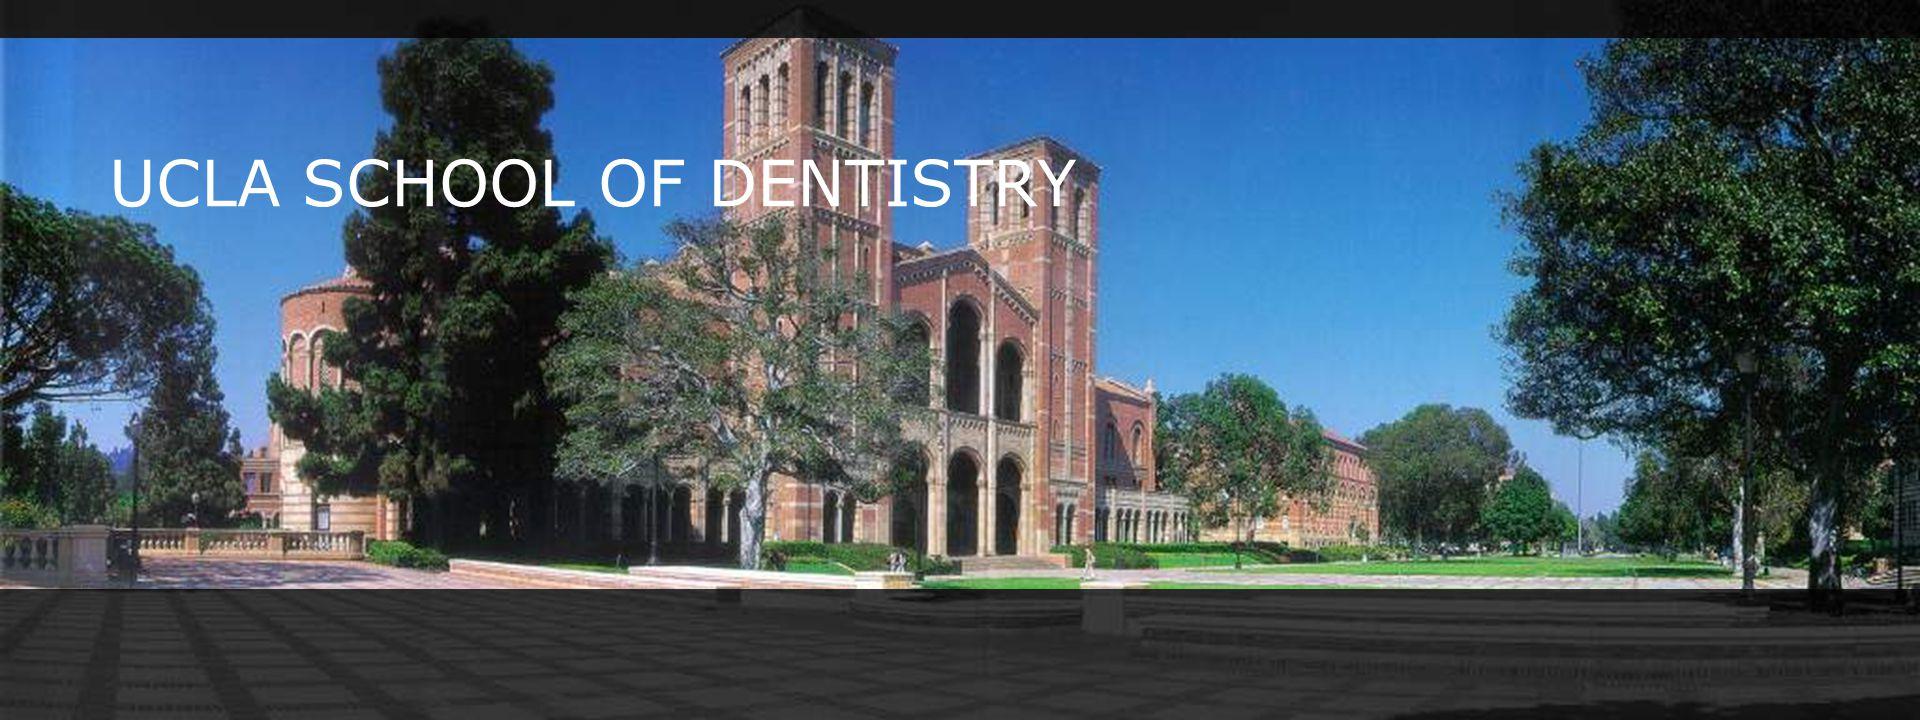 UCLA SCHOOL OF DENTISTRY